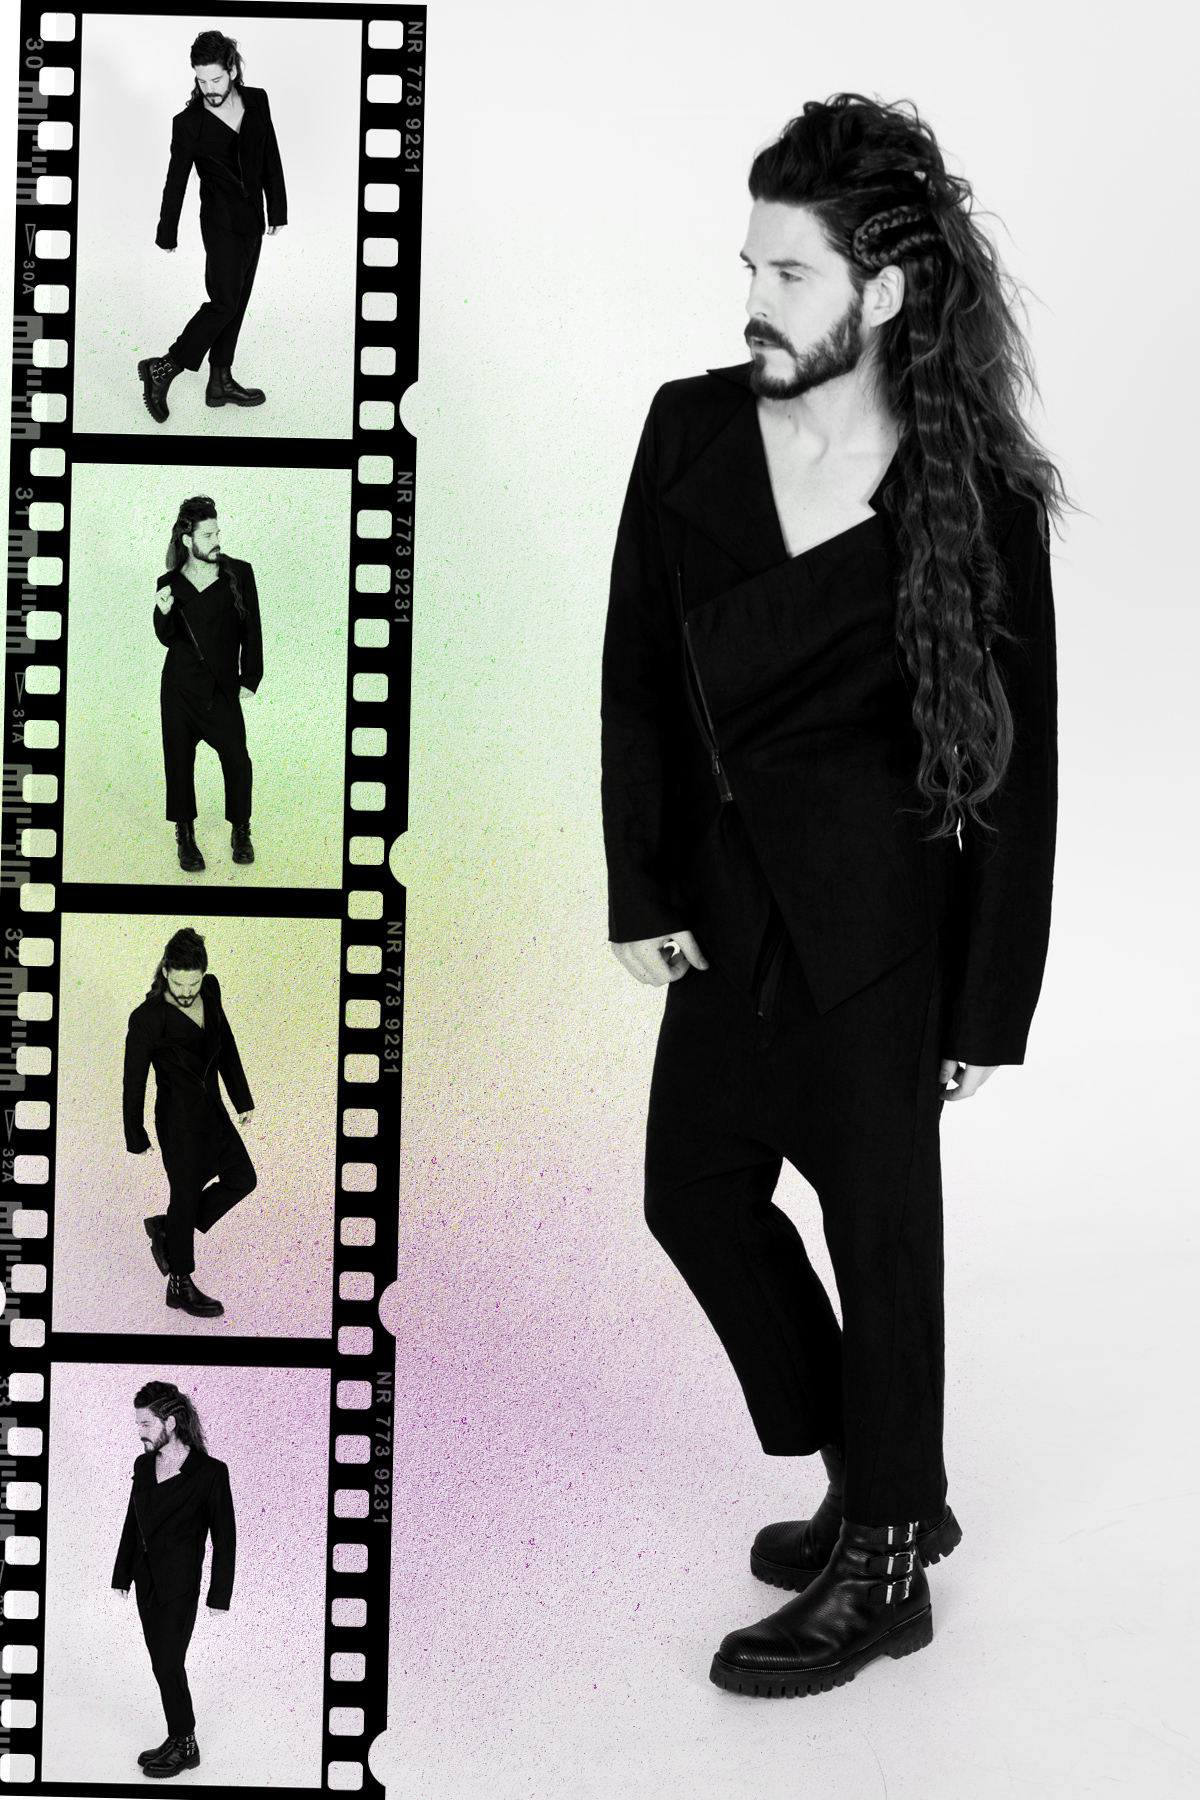 Editorial-Aleks-Kurkowski-Malefashion-Designer-Mode-High-Fashion-Avantgarde-Menswear-02